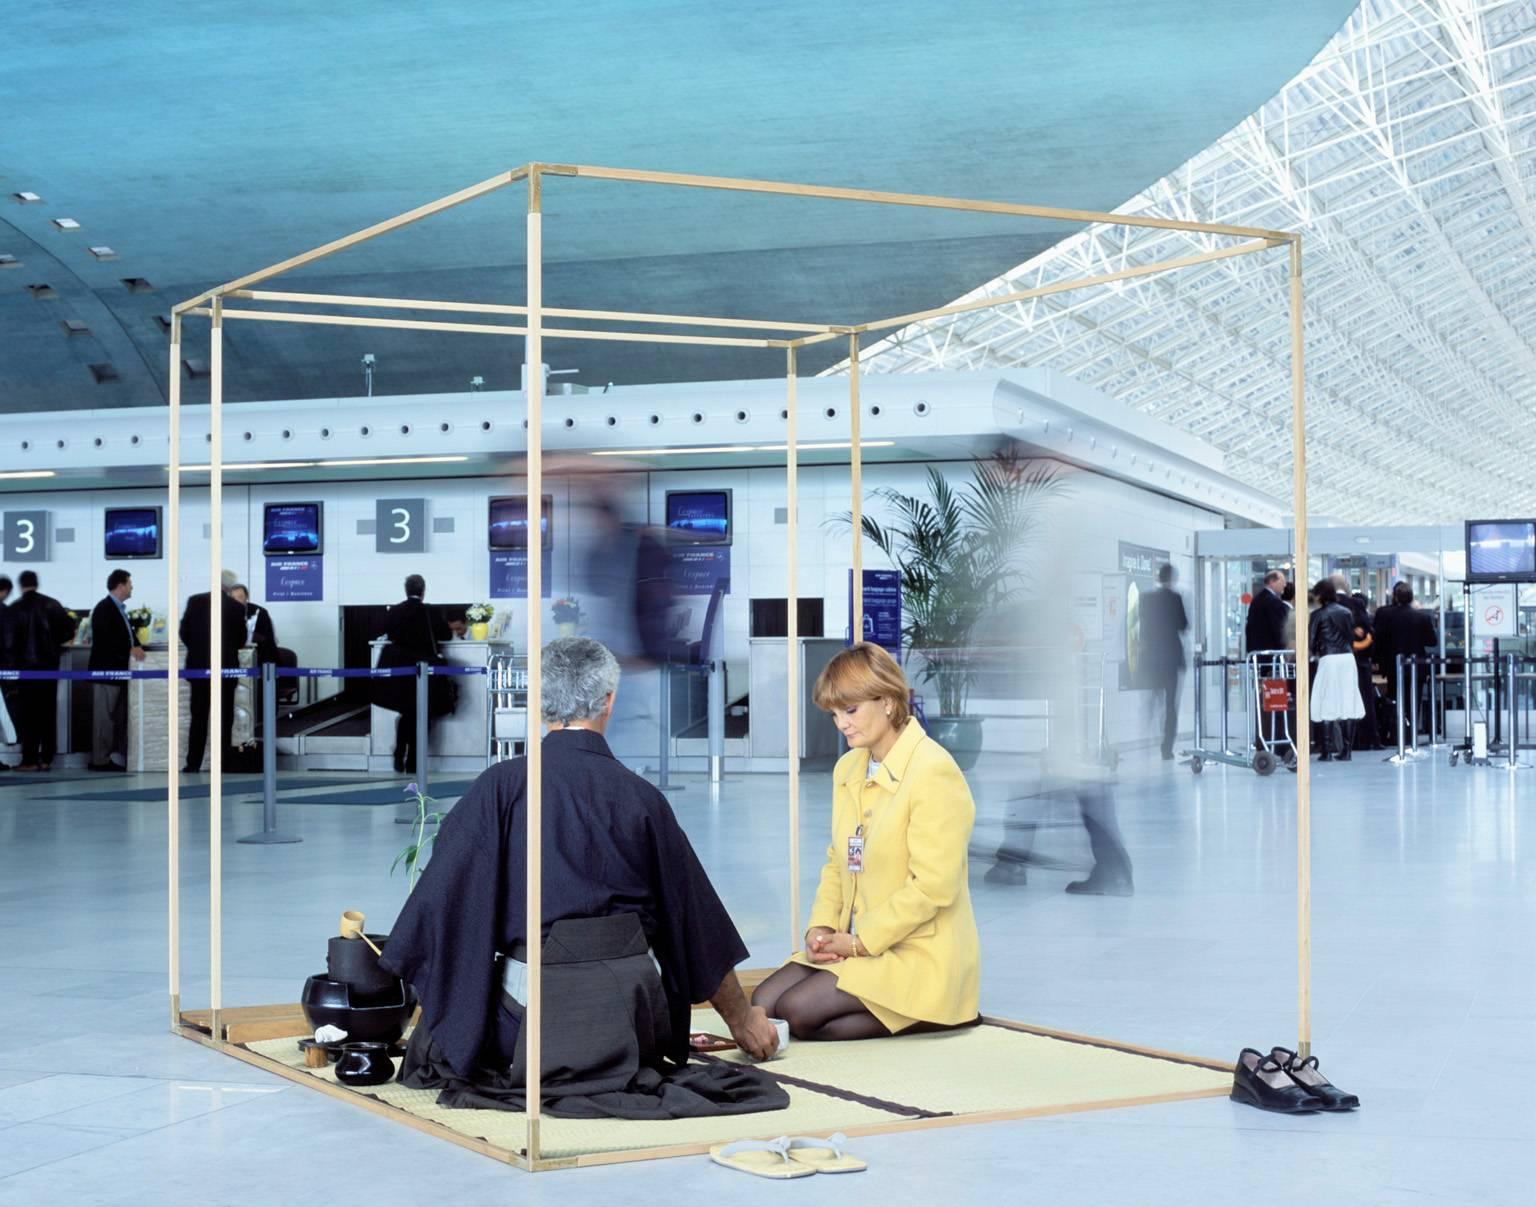 T016, Alice, CDG Airport, Paris, France, 2002